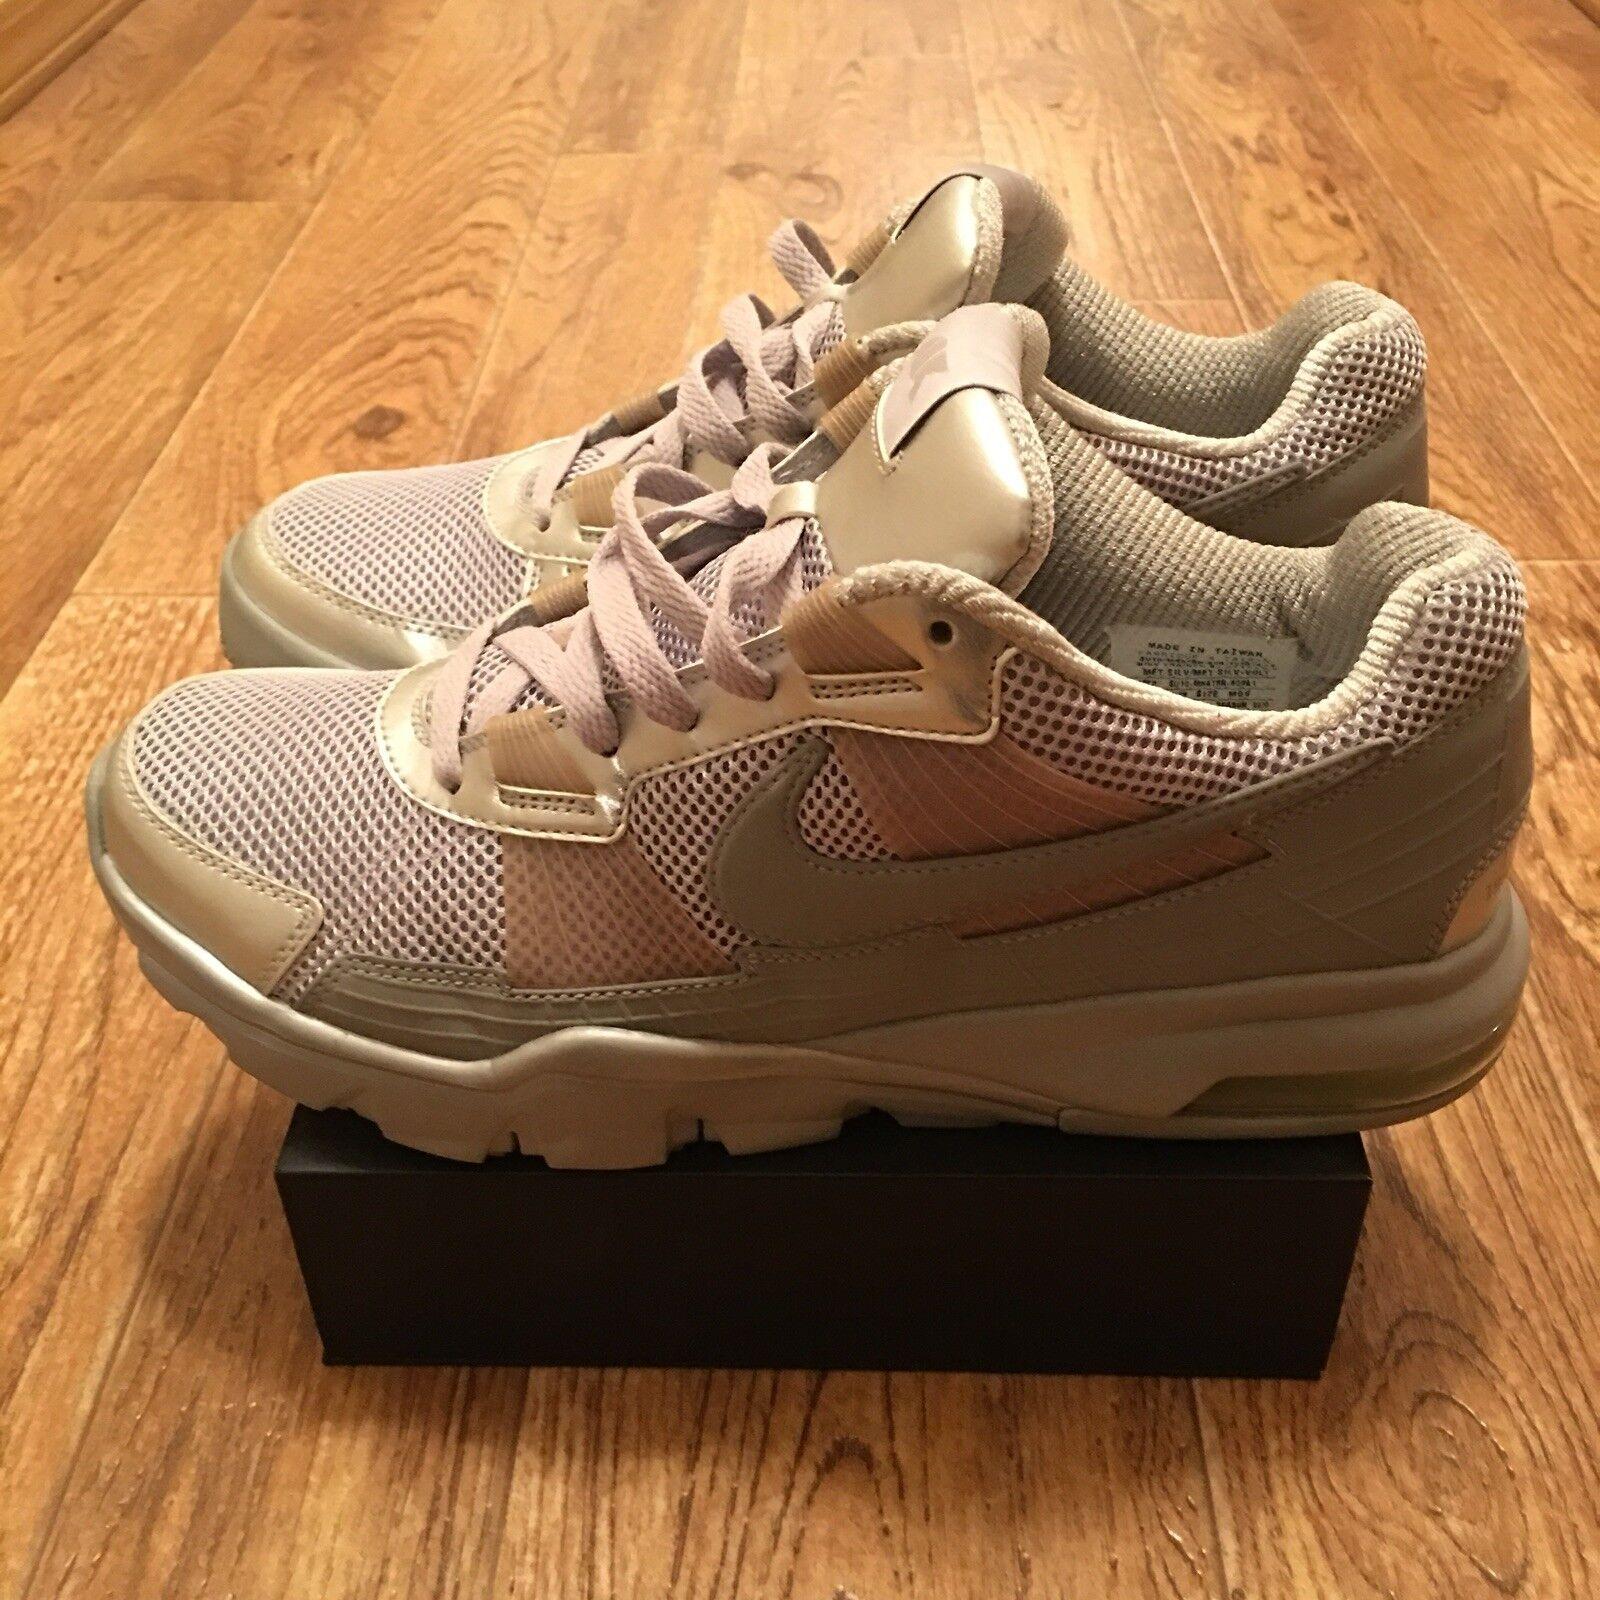 Nike Trainer SC 2010 Low Mens Shoes Silver/Volt  NO INSOLES  Paquiao Mens S 9